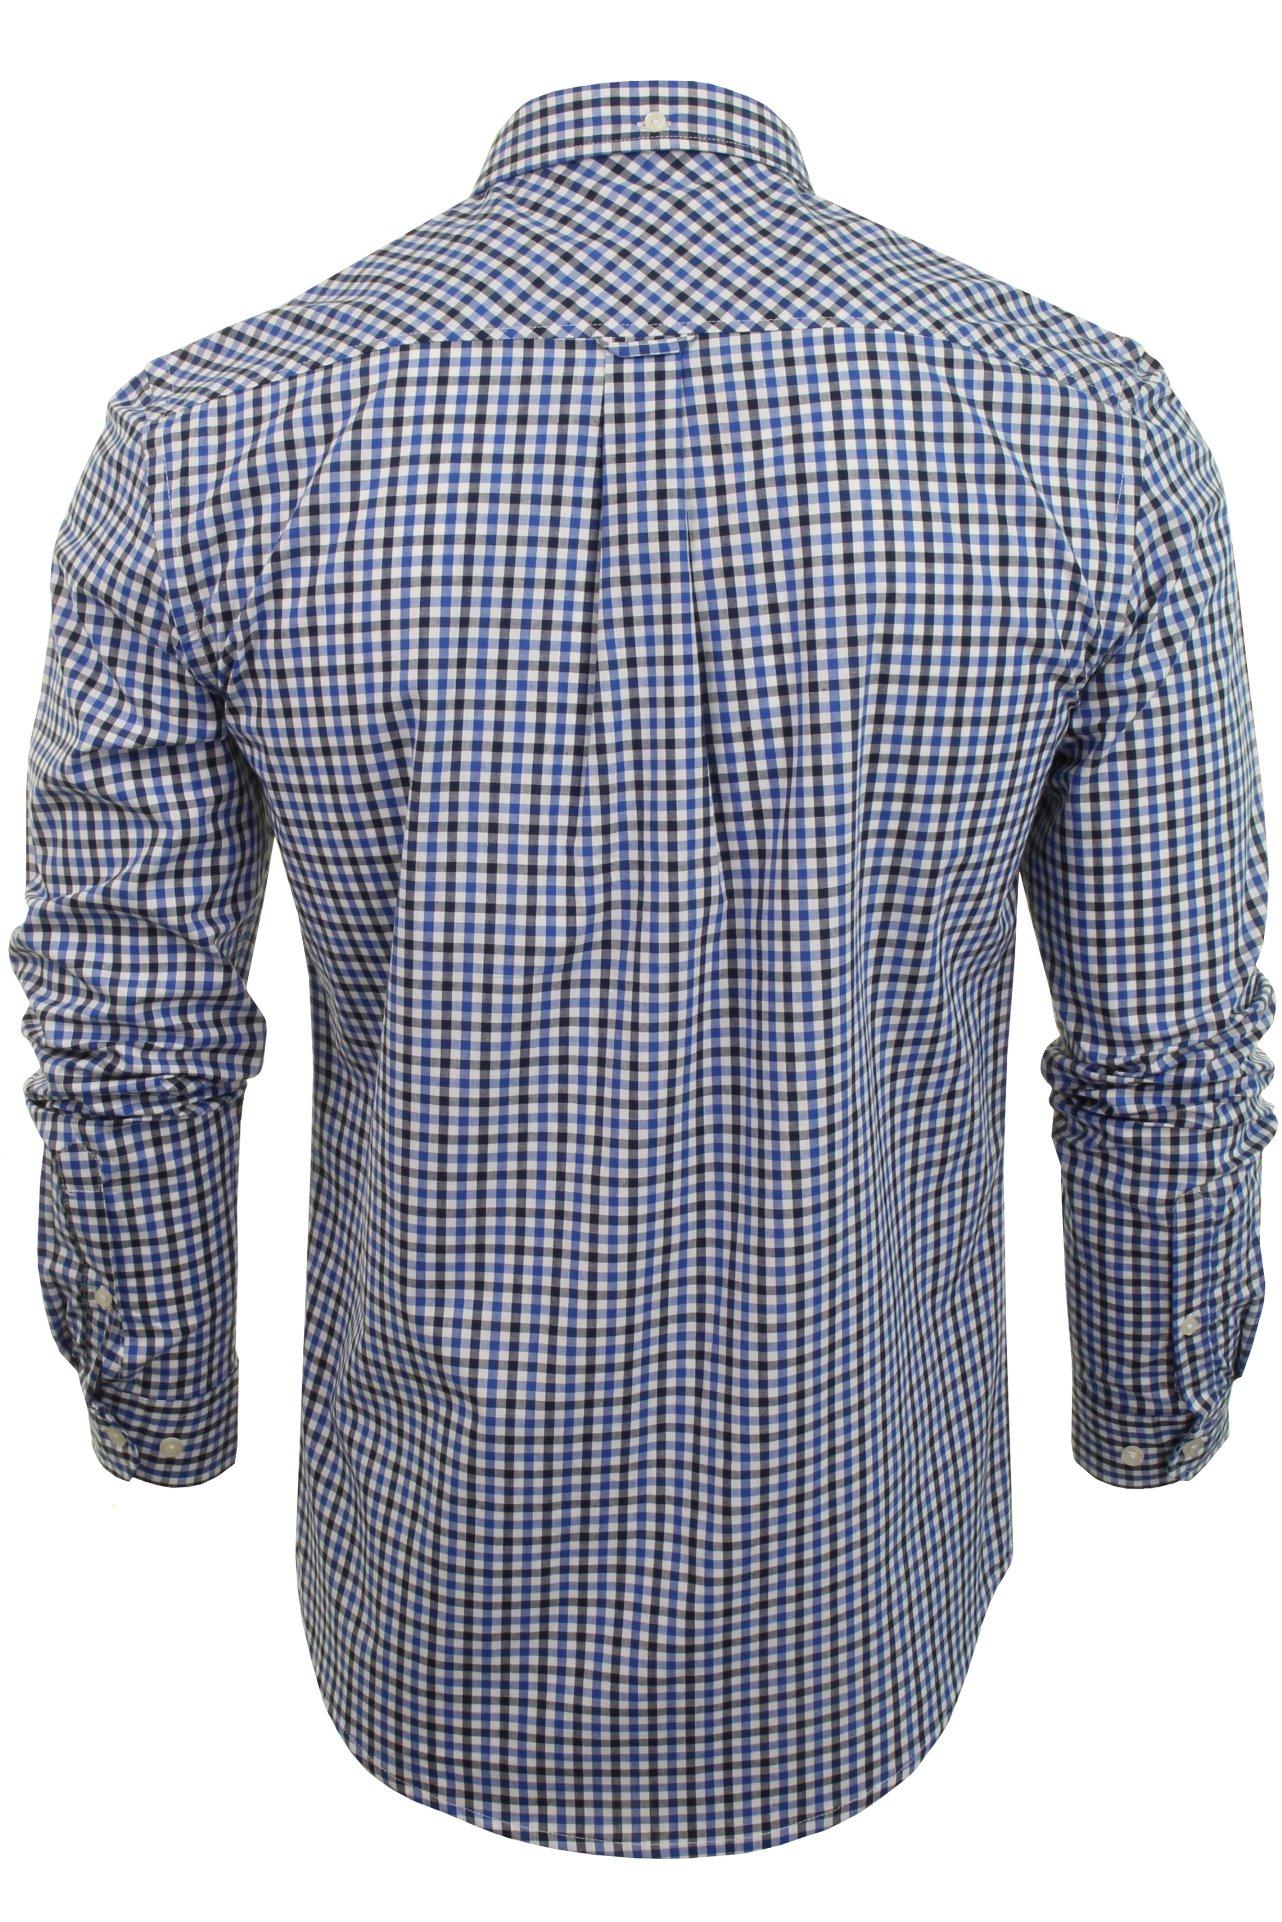 Ben-Sherman-Men-039-s-Long-Sleeved-Gingham-Check-Shirt miniatuur 5